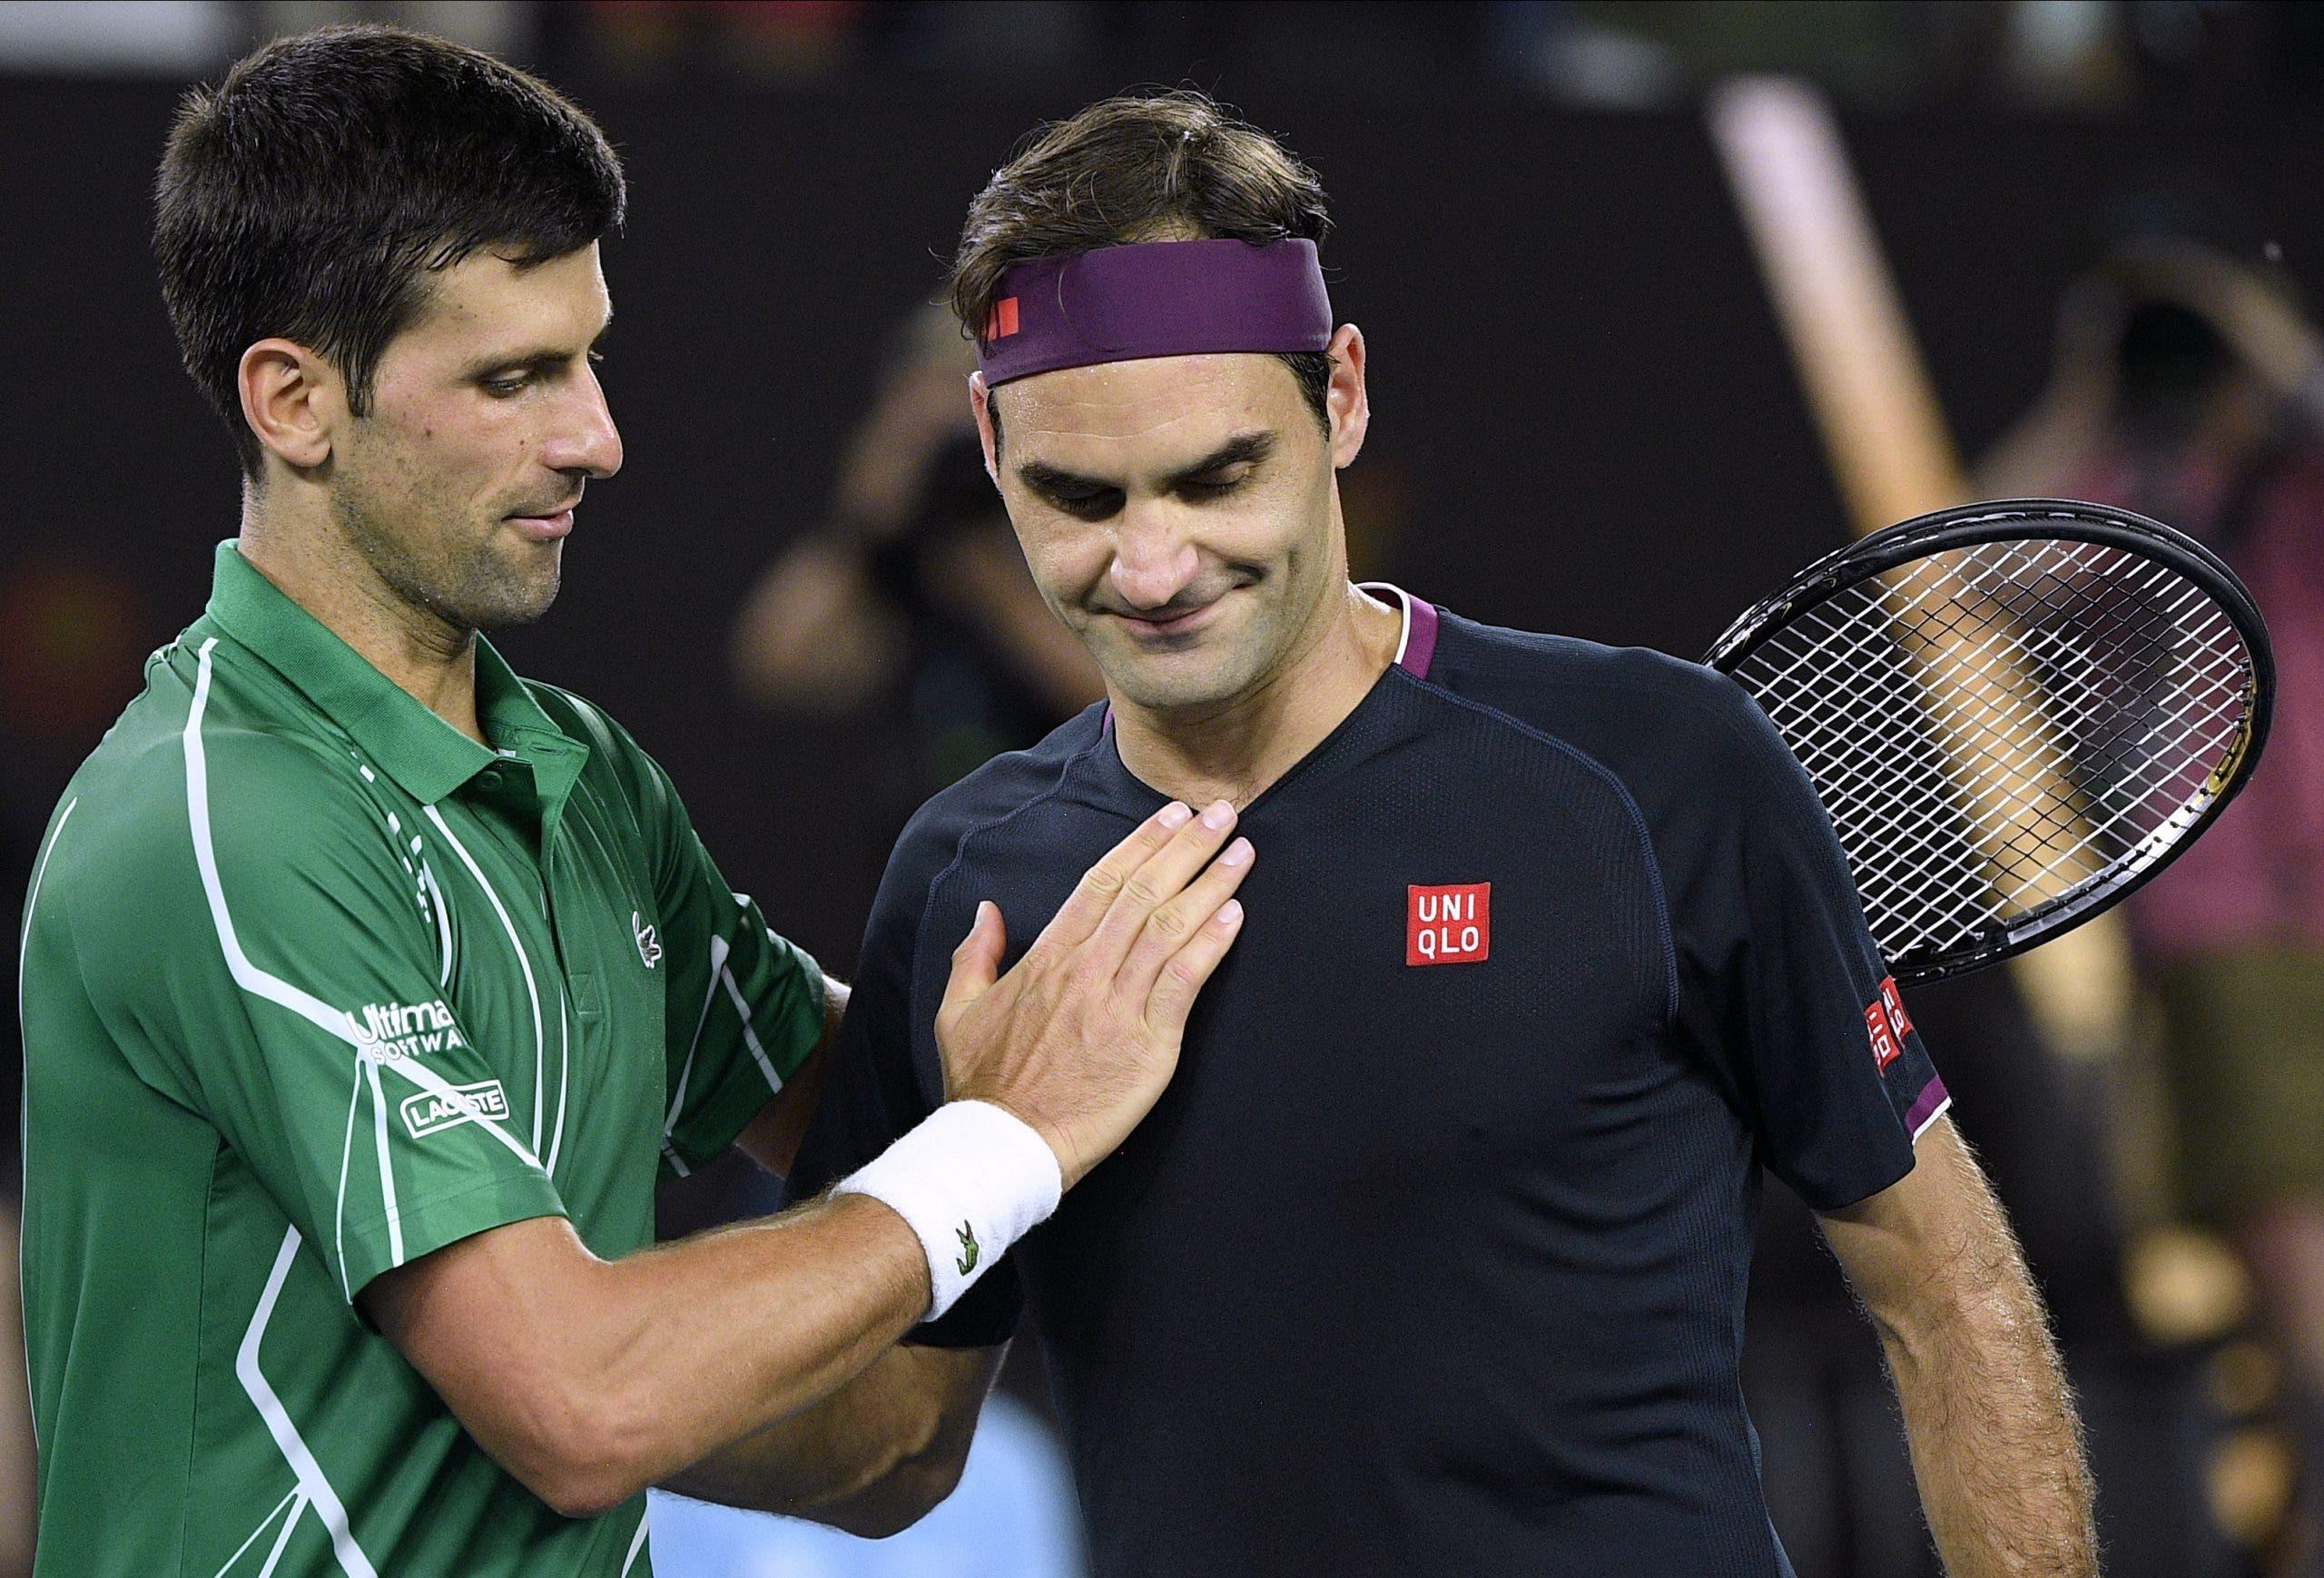 Djokovic derrota a Federer y disputará la final en Australia